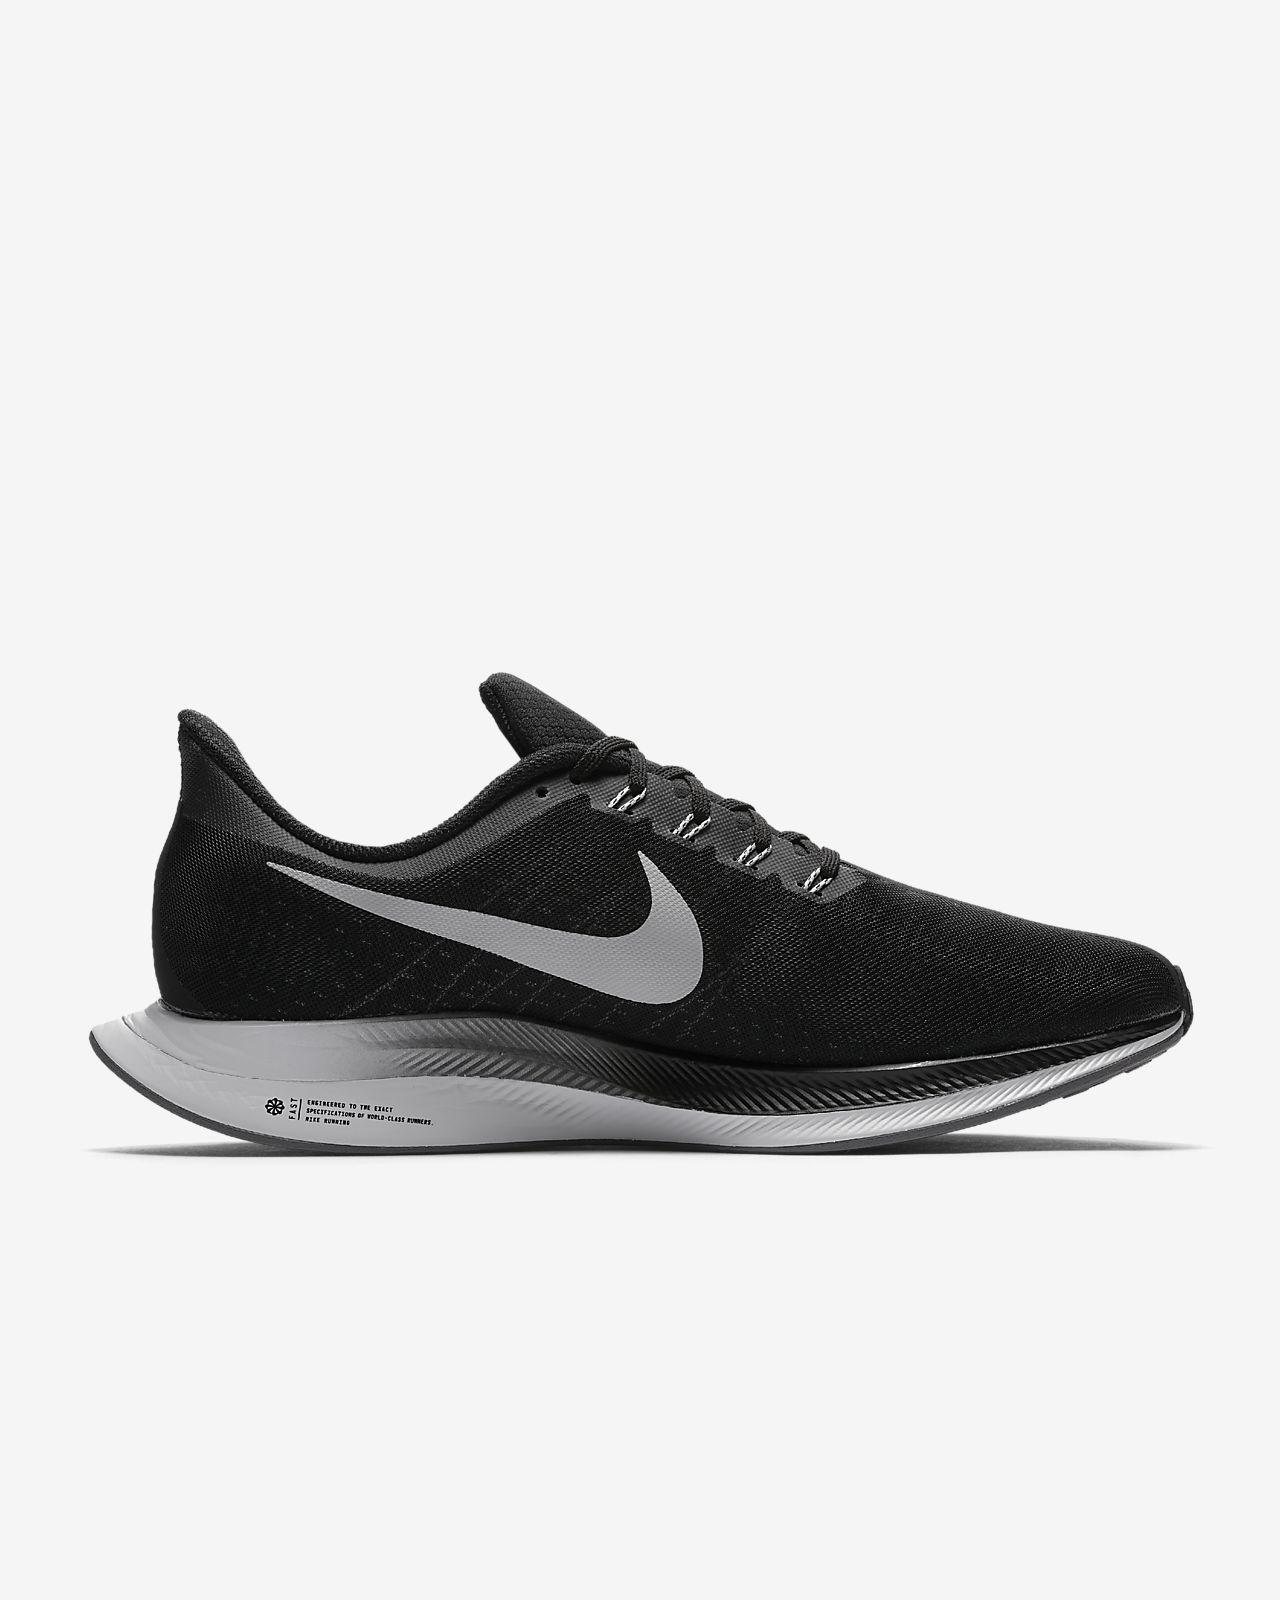 buy cheap fc05e d8337 ... Chaussure de running Nike Zoom Pegasus Turbo pour Homme